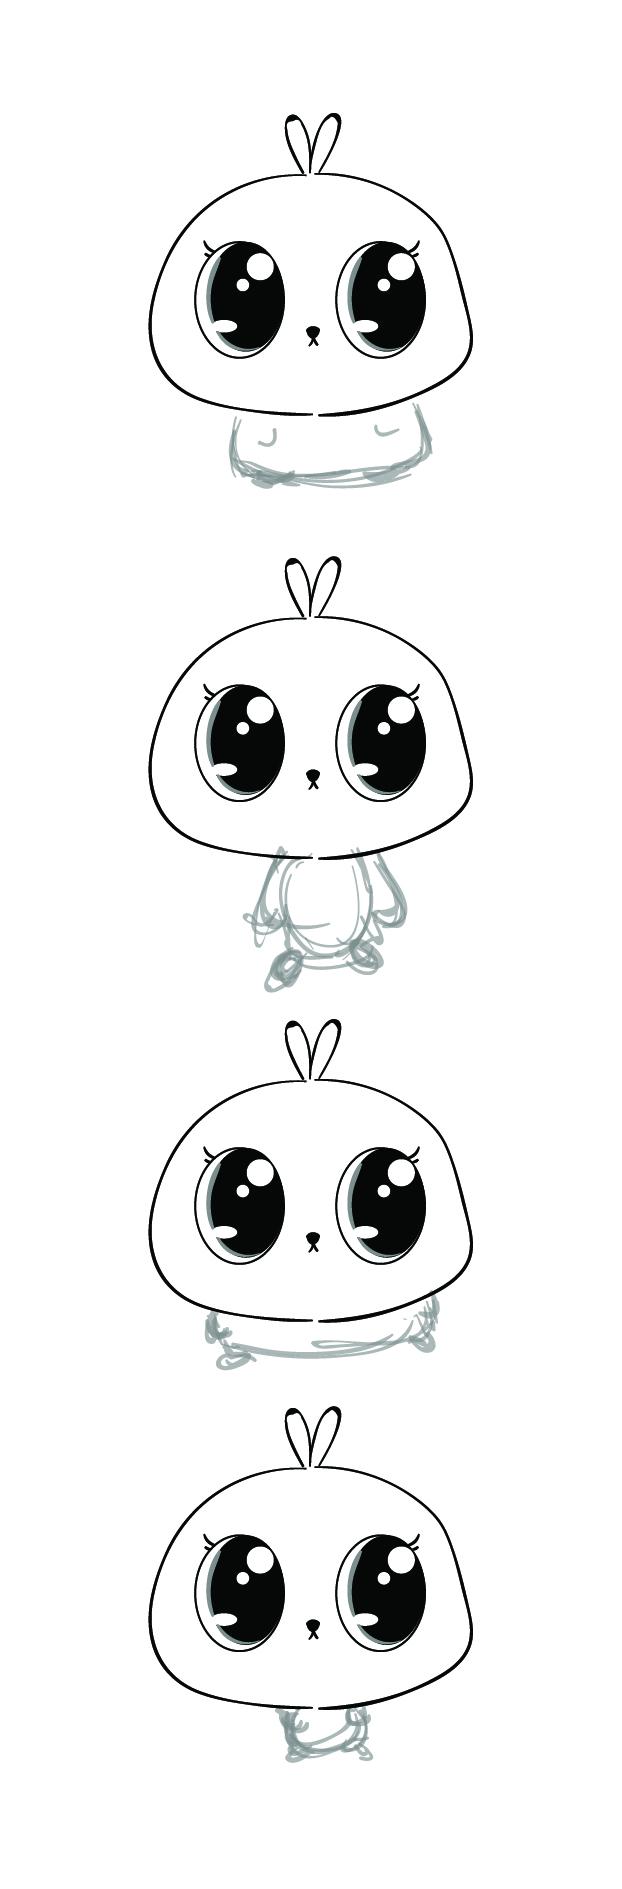 2019-07-08 Bunny Concept Bodies.jpg